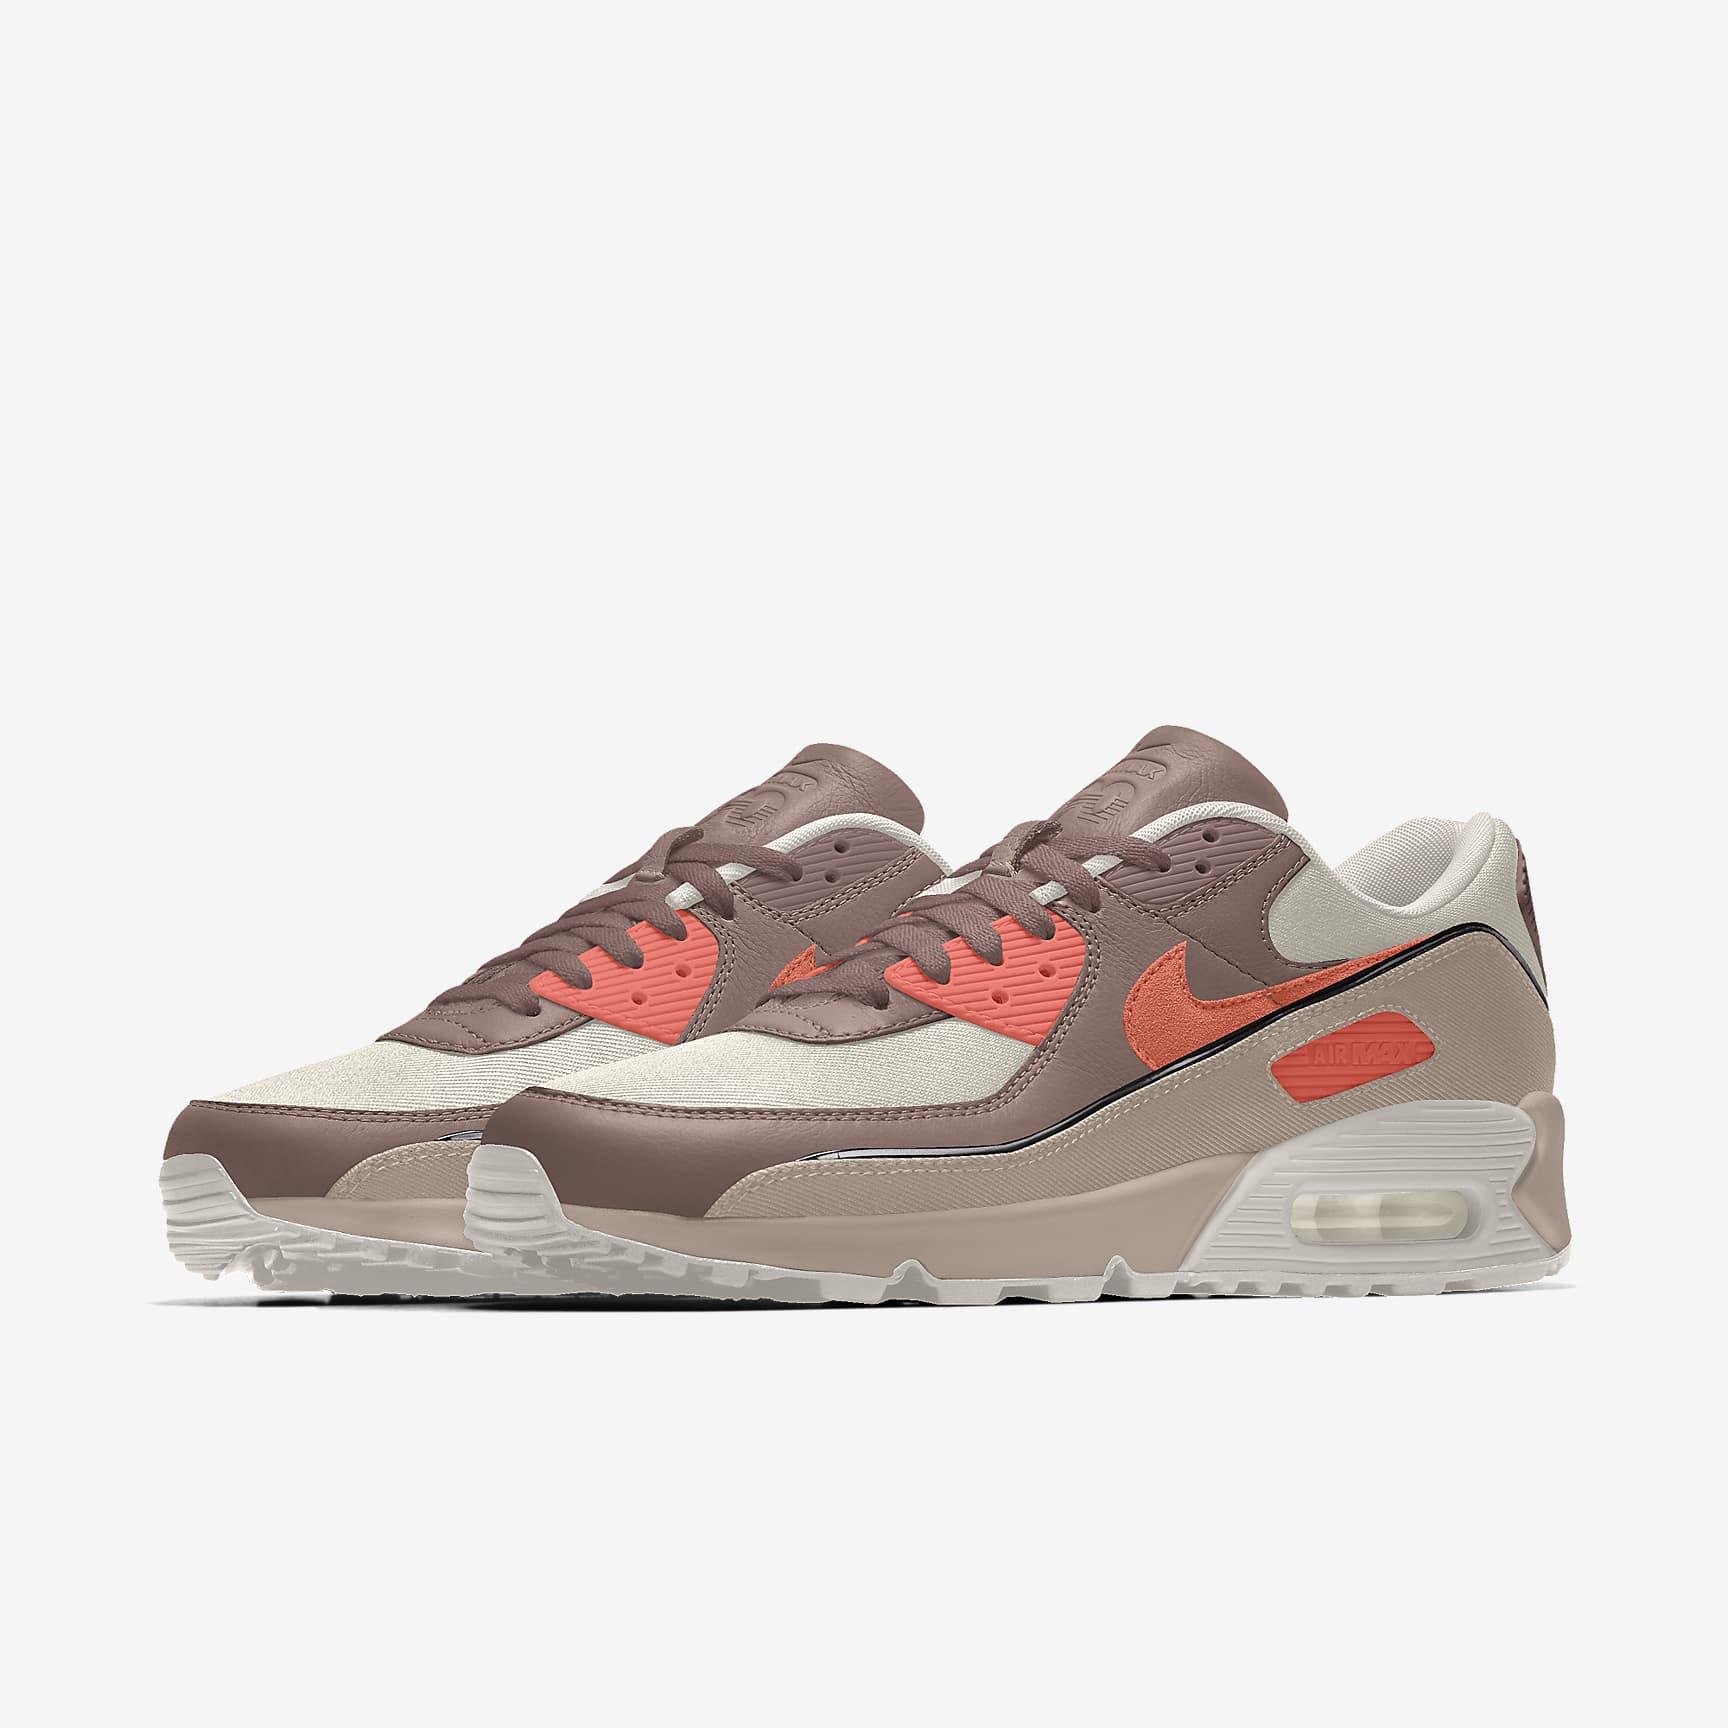 Nike,Air Max 90,Nike By You,DJ  又添新材质!Nike 开启 Air Max 90 官方定制!